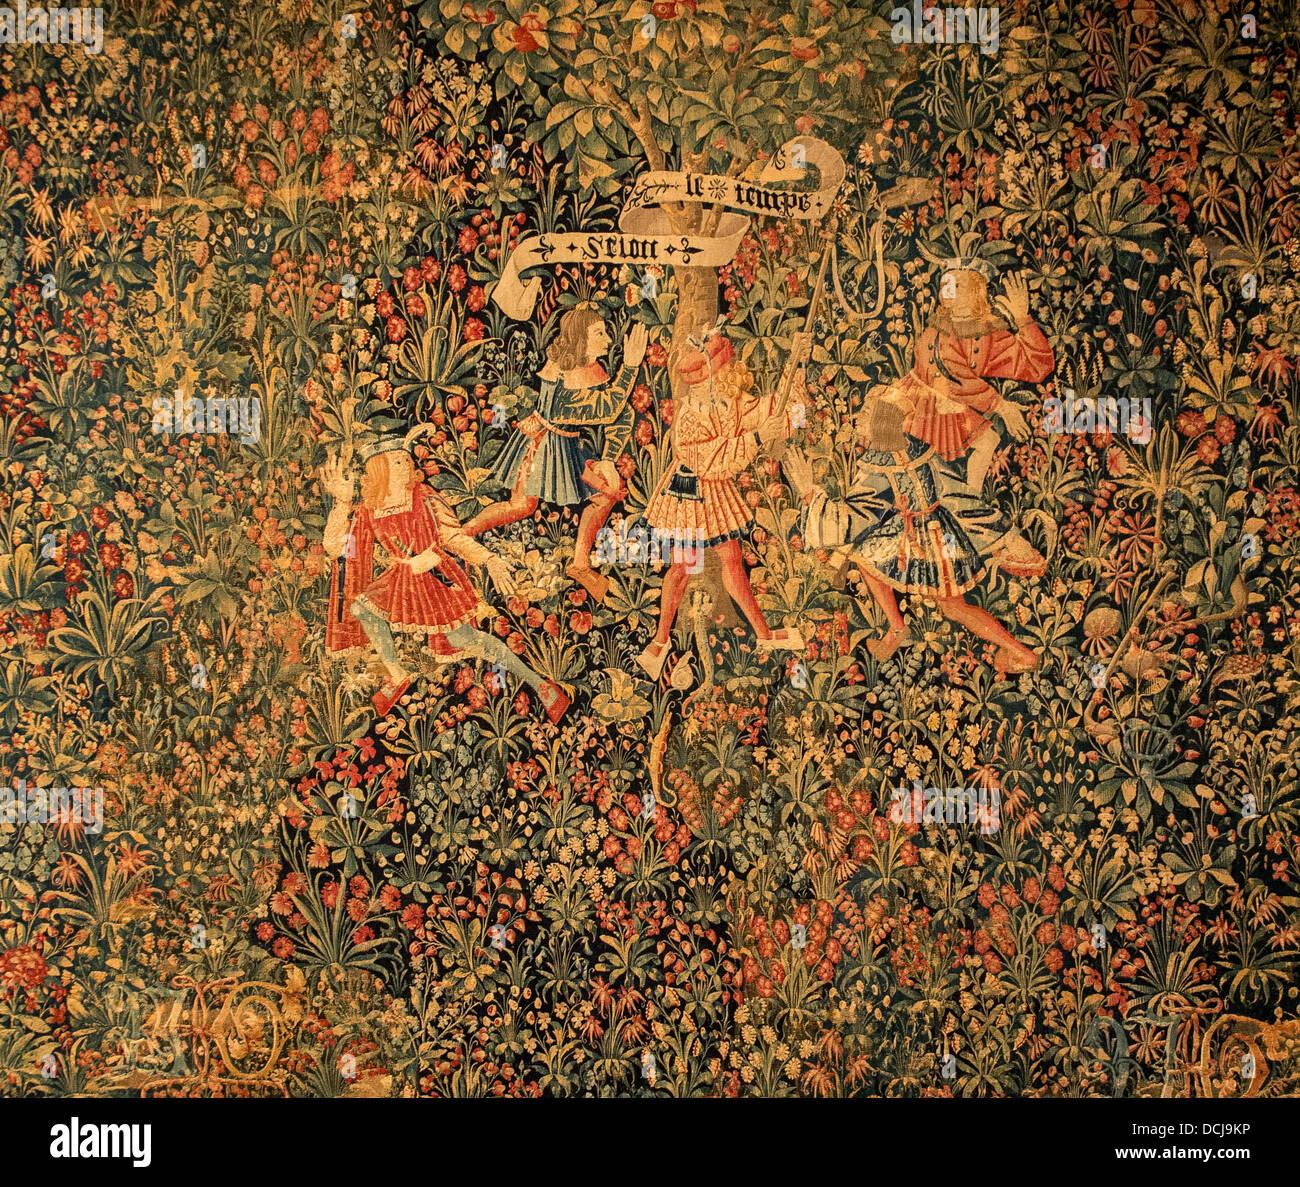 16e siècle - Tapisserie - (Berne / Suisse, XVIème siècle) - Metropolitan Museum of Art - New York Photo Stock